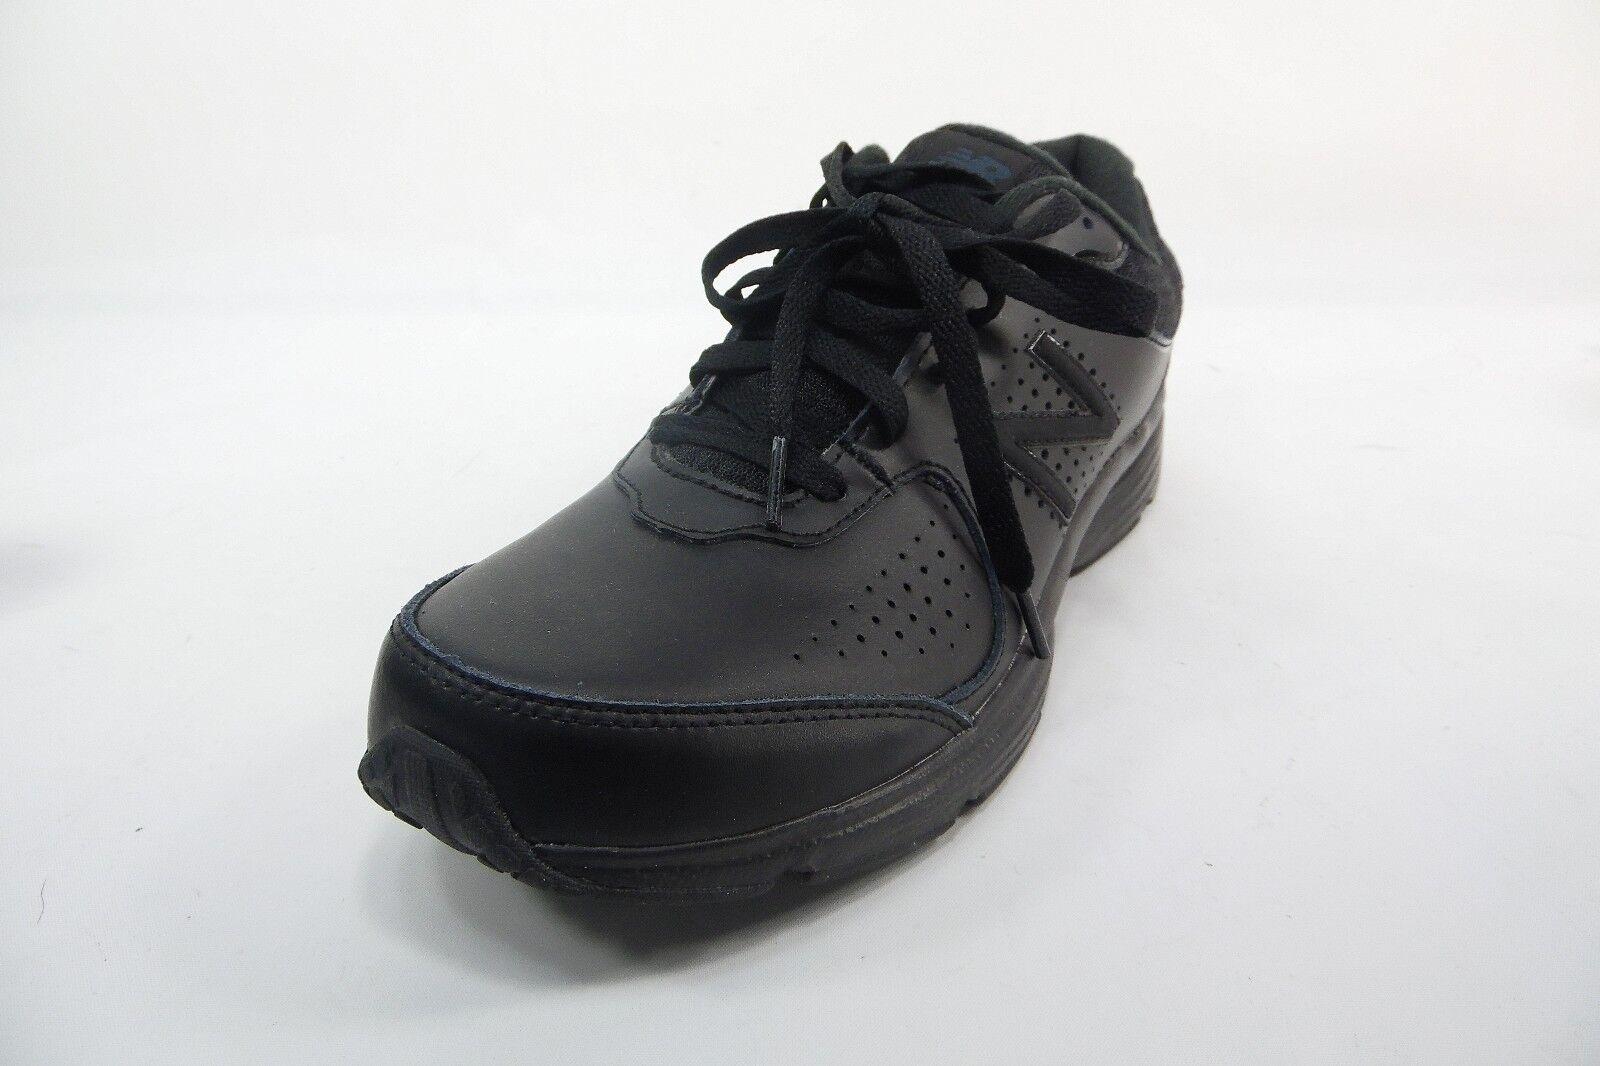 New Balance Men's MW411BK2 Walking shoes Sneakers Black Size 8.5 D